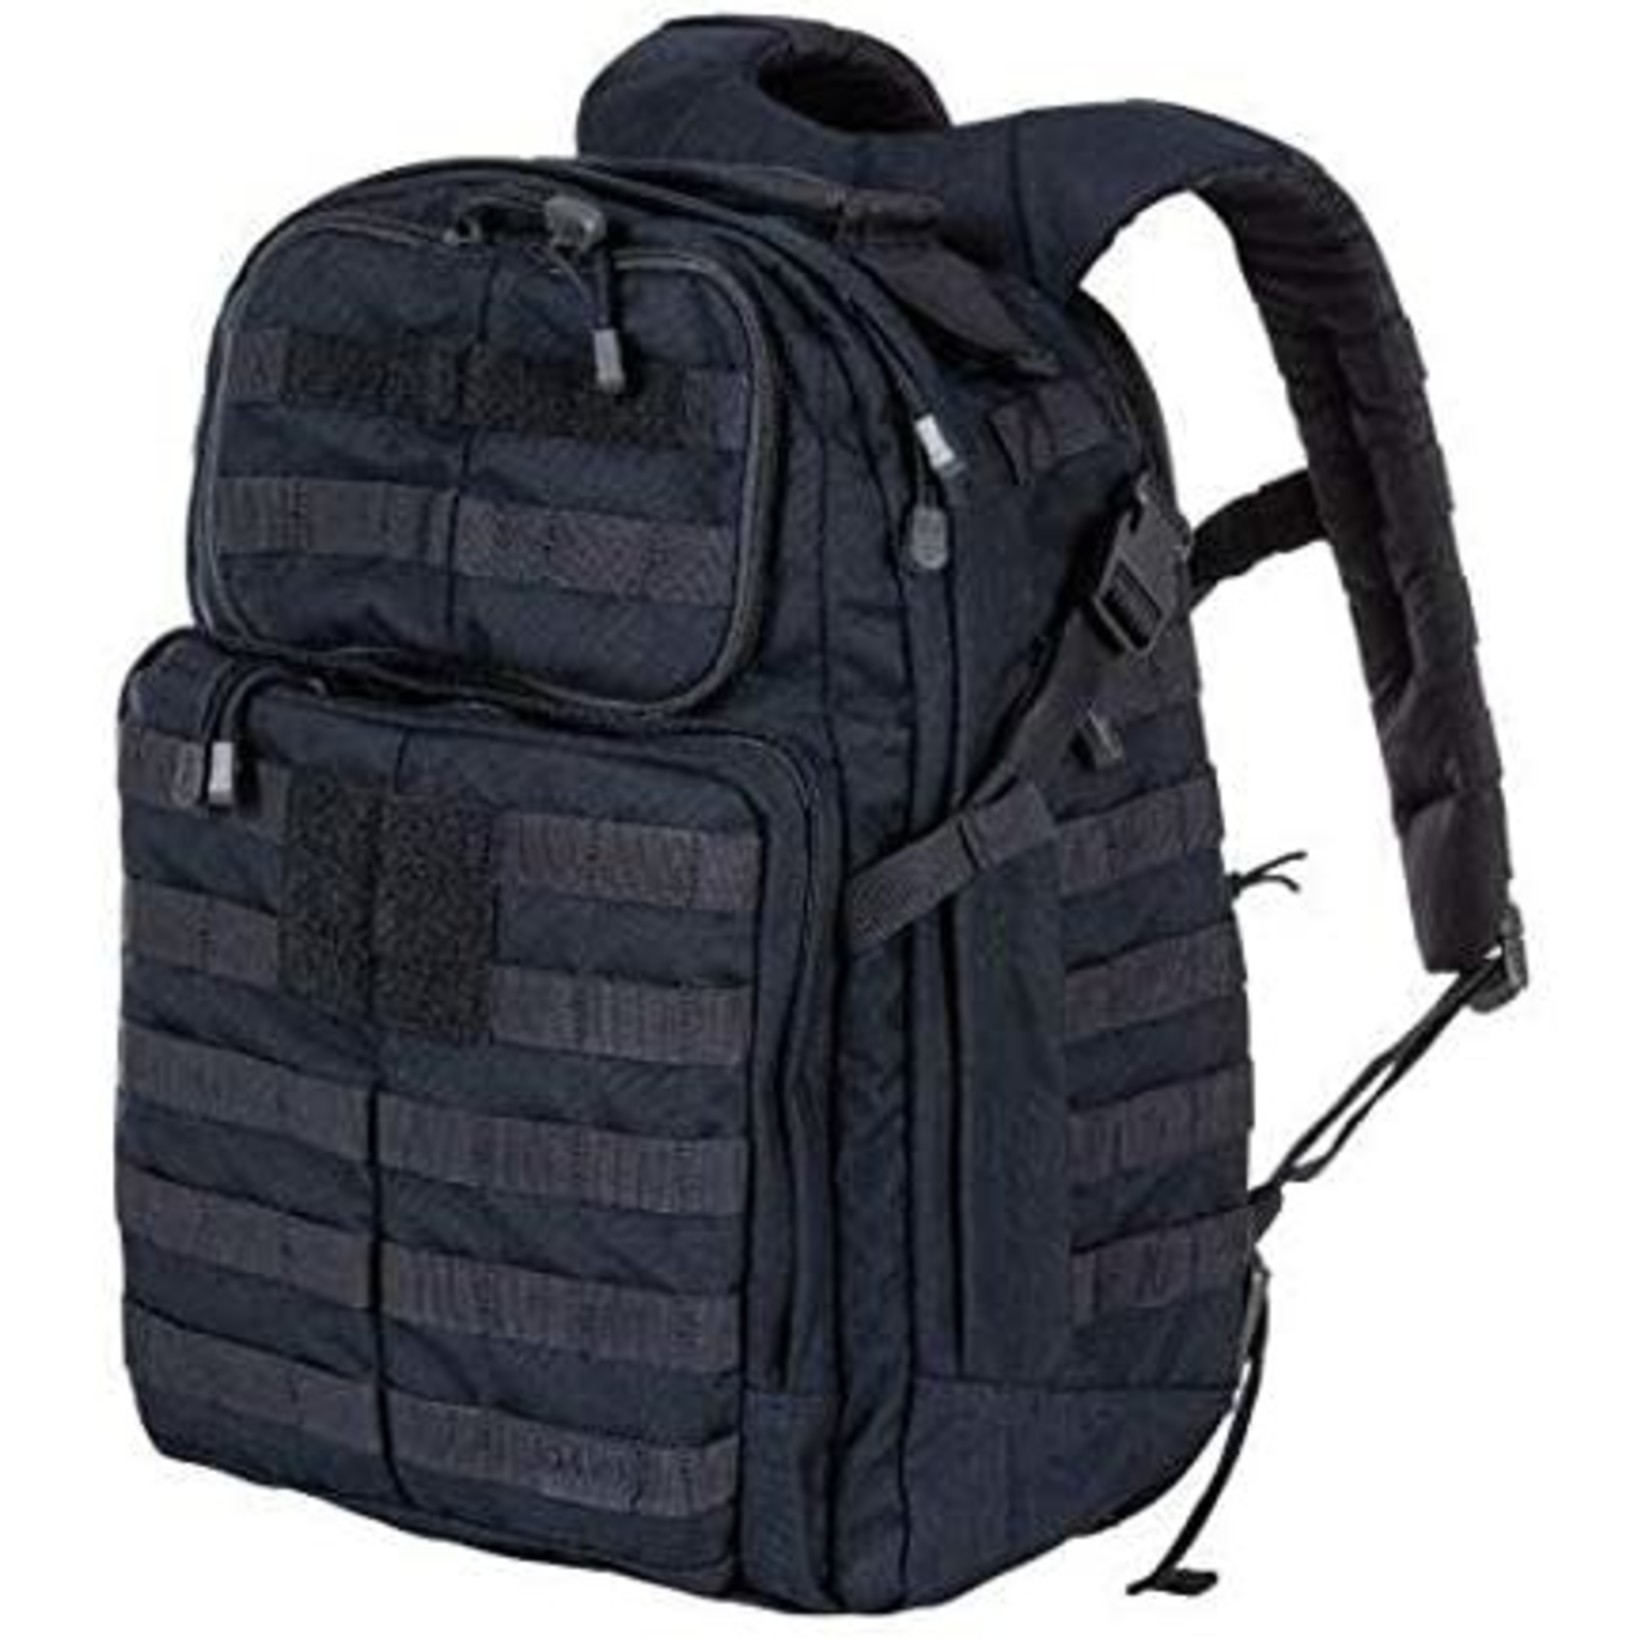 5.11 Tactical 5.11 Rush 24 Backpacks